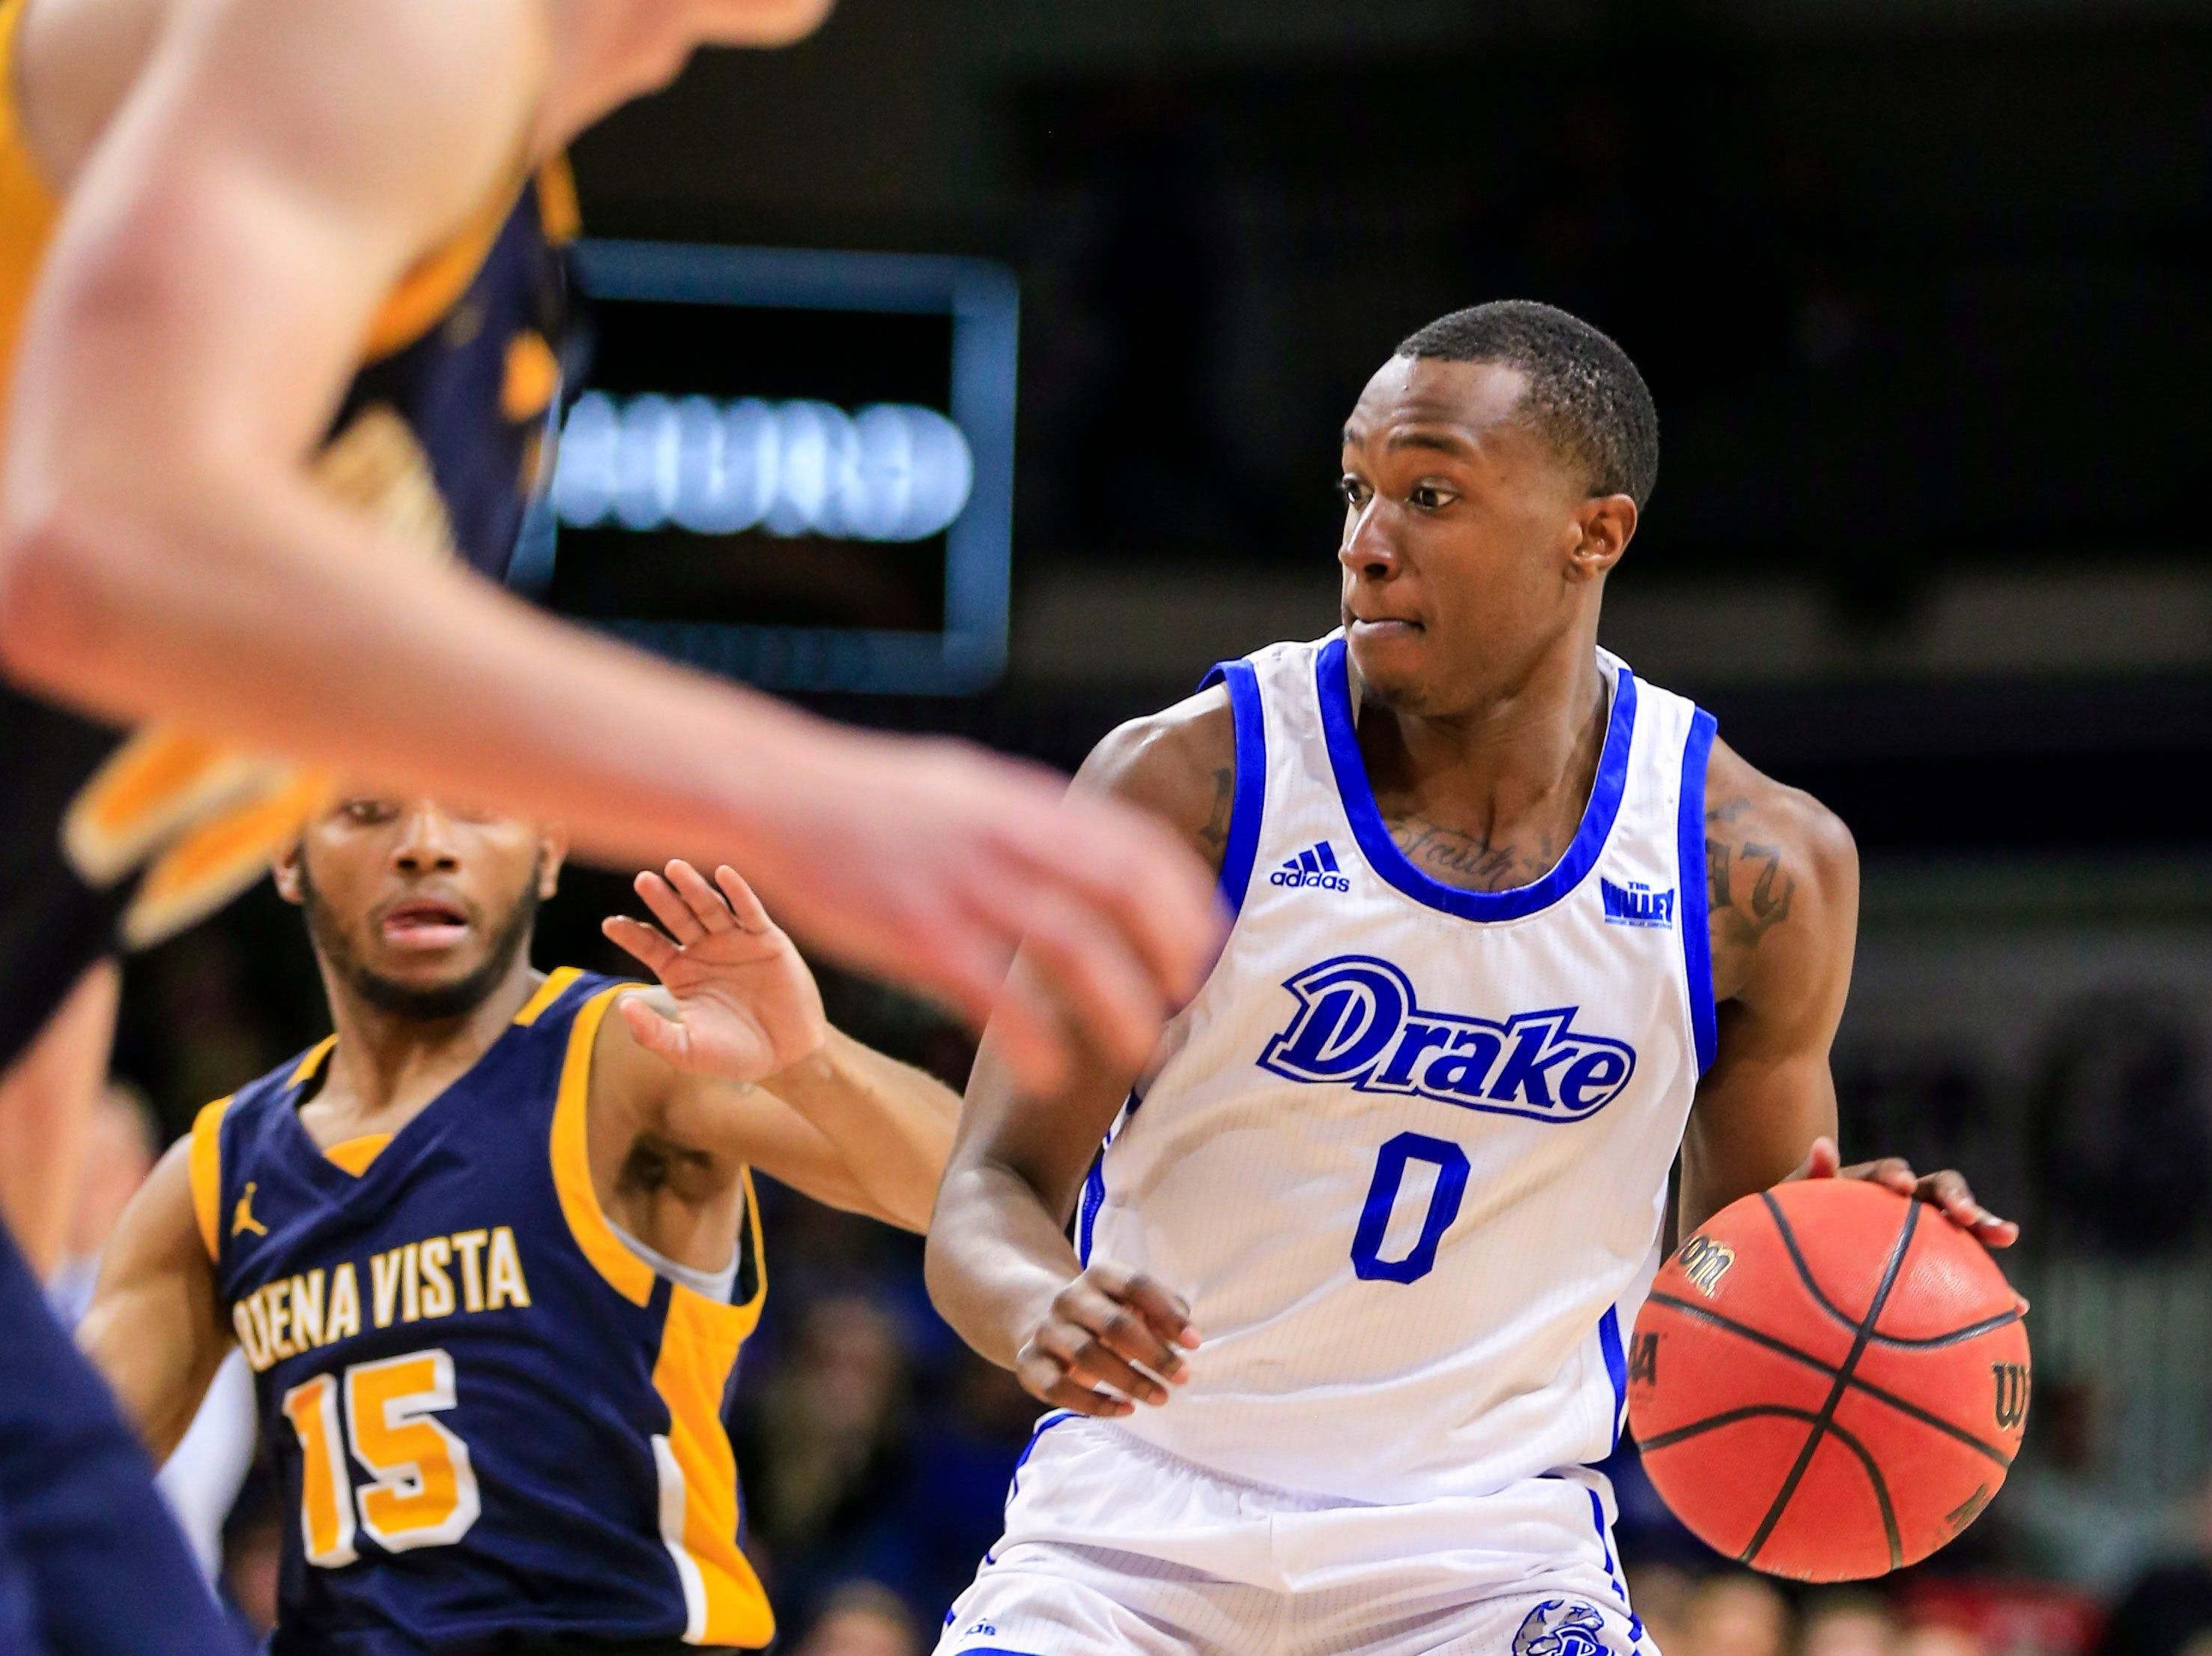 D.J. Wilkins of Drake drives to the basket during a game against Buena Vista at the Knapp center Thursday, Nov. 8, 2018.